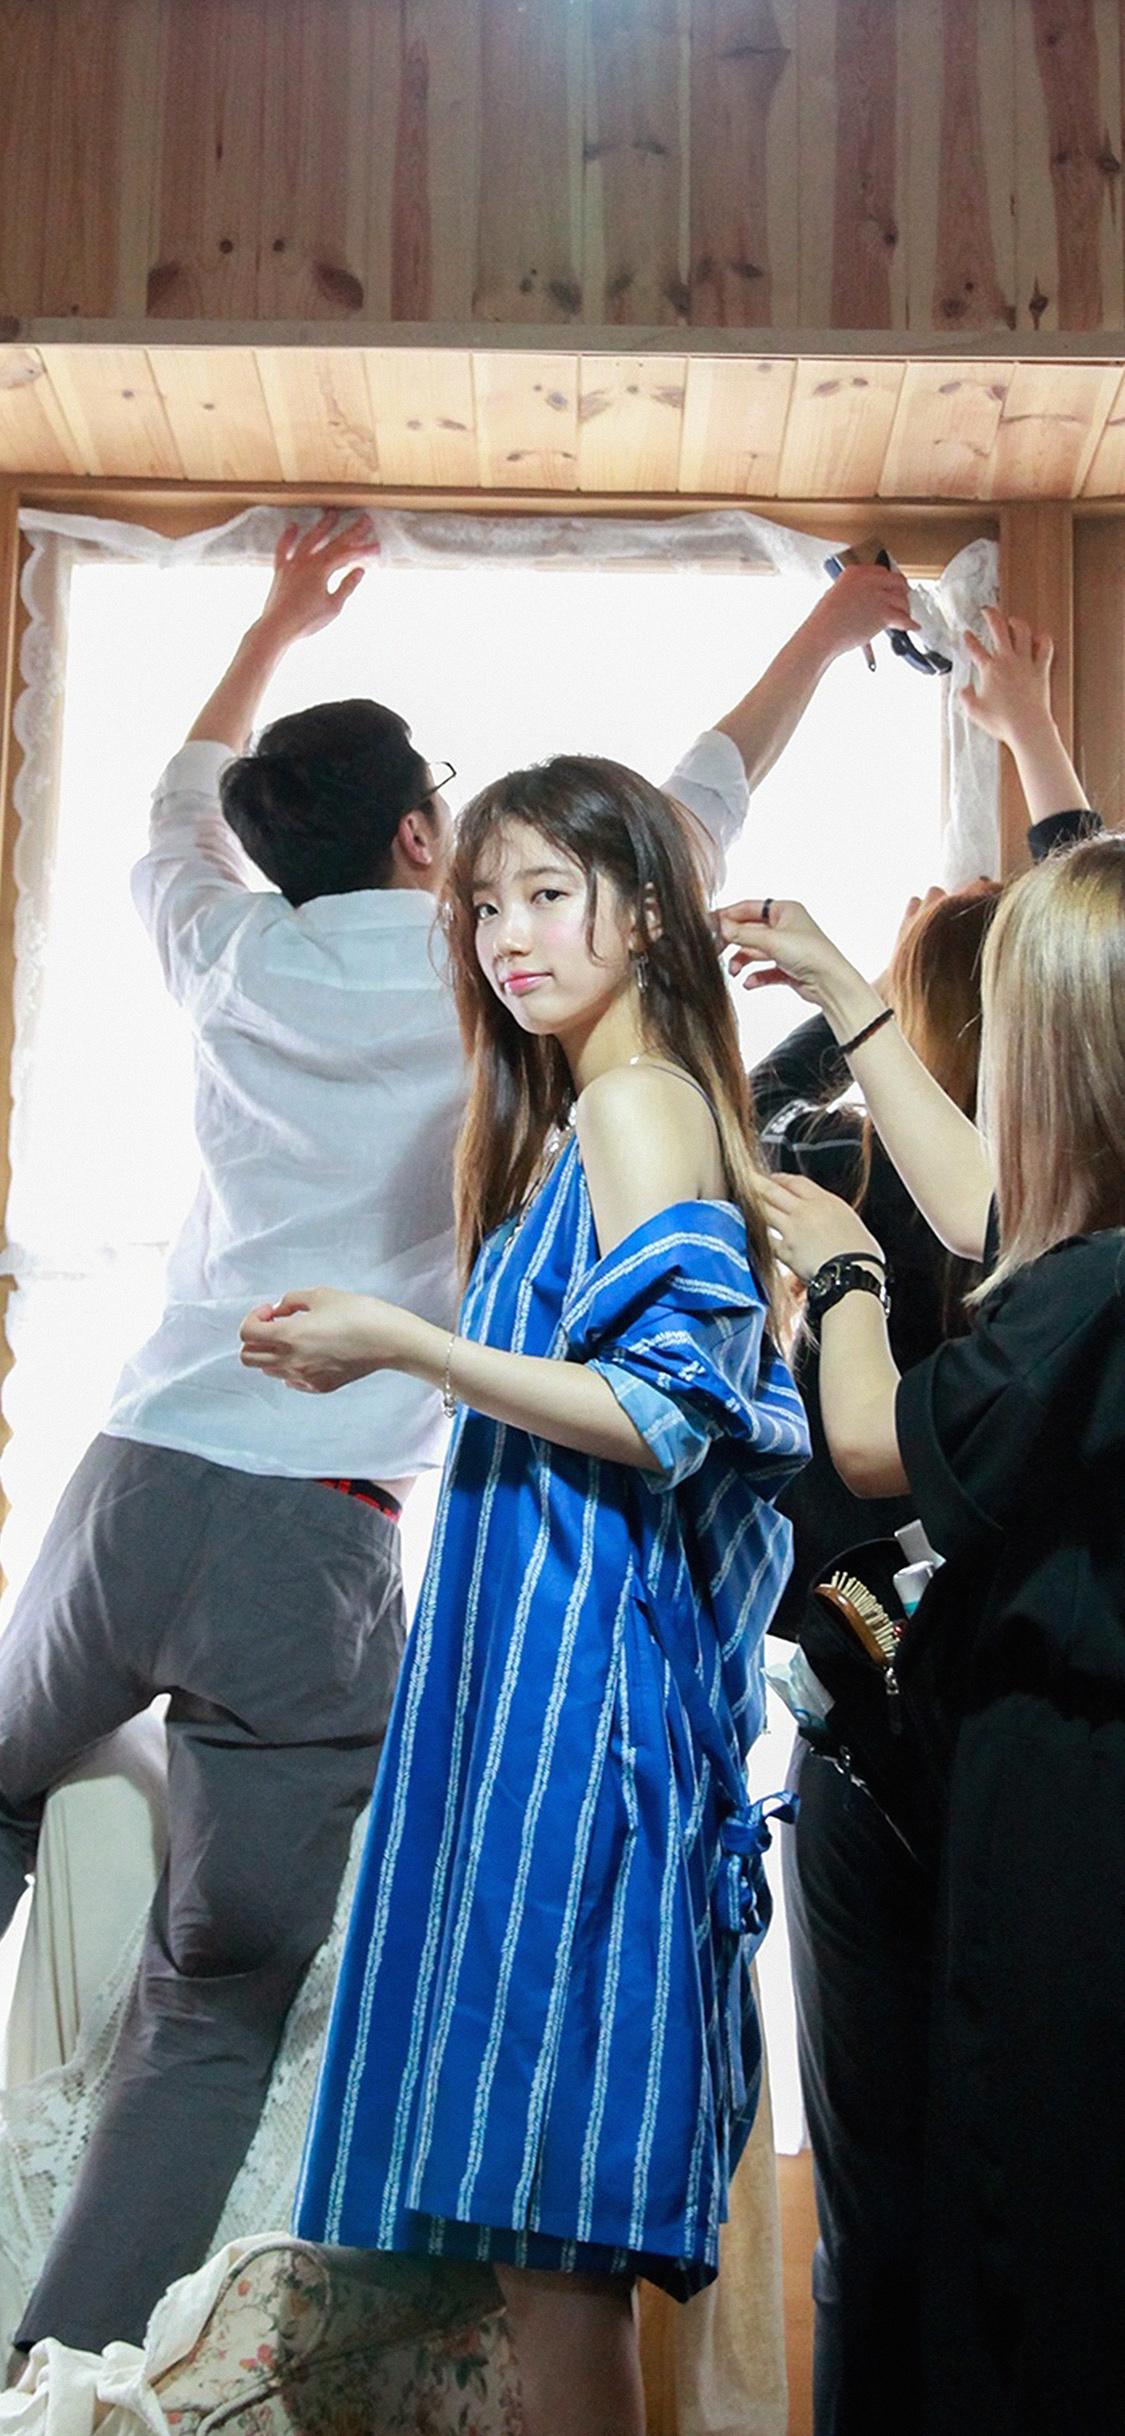 iPhoneXpapers.com-Apple-iPhone-wallpaper-hj79-suji-jyp-girl-kpop-photoshoot